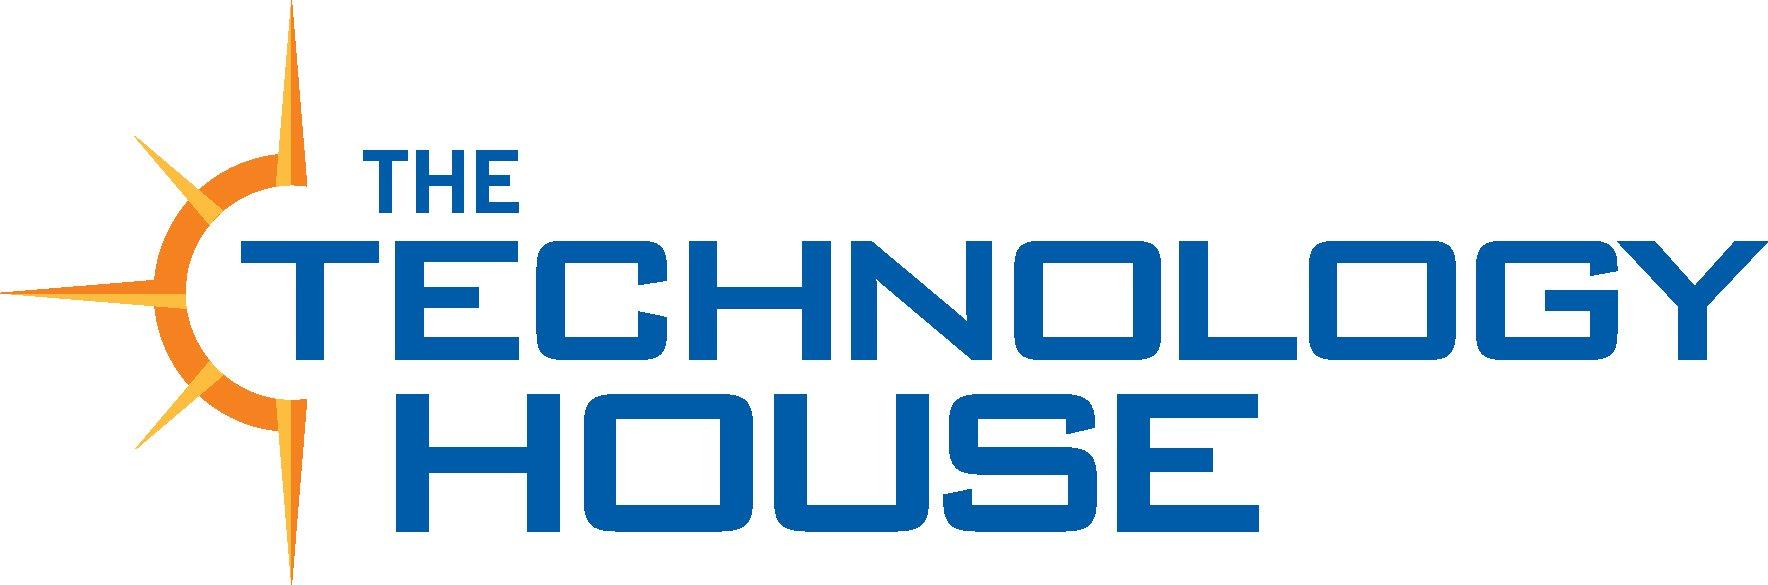 the technology house logo